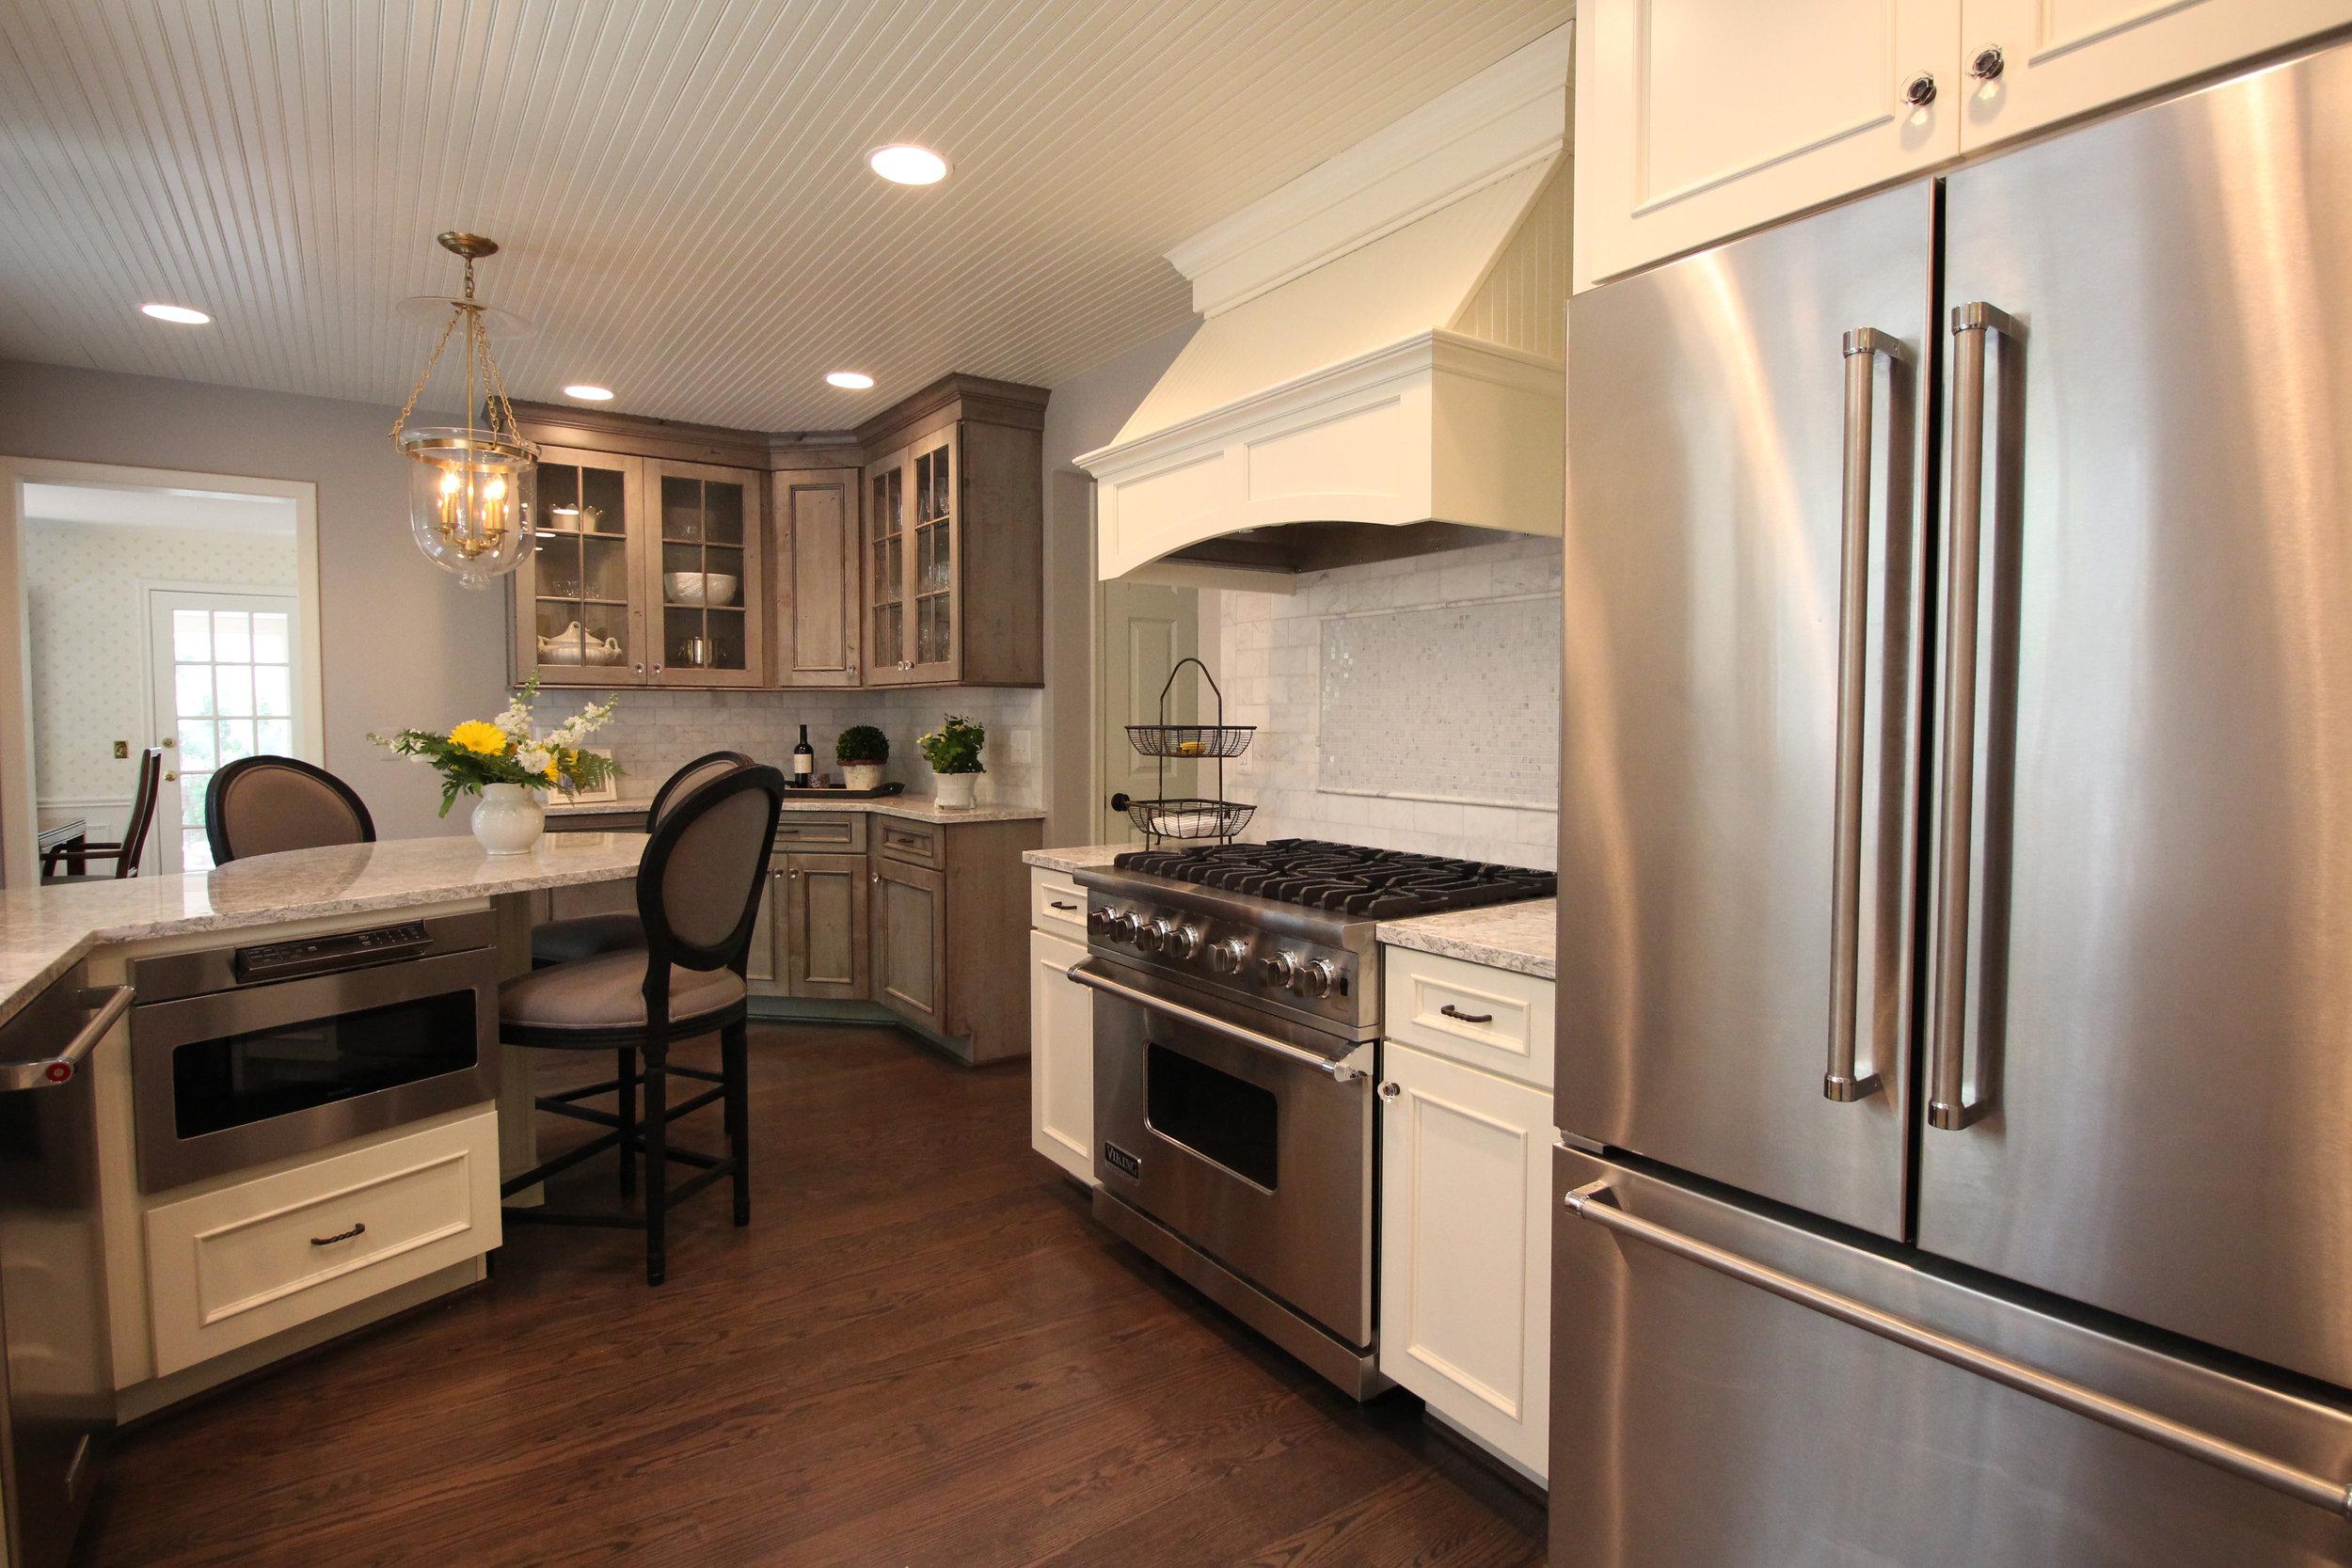 white kitchen design with stainless steel appliances